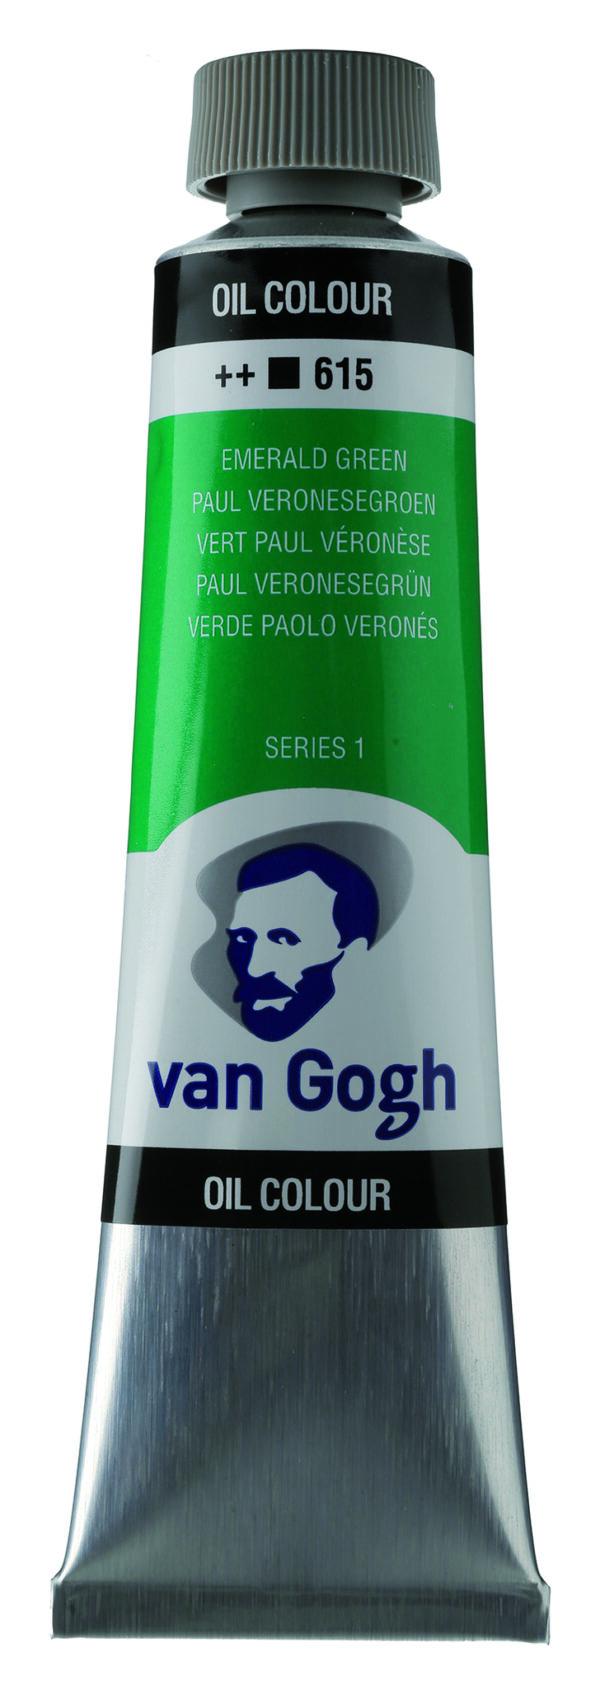 Van Gogh 615 Emerald green - 40 ml